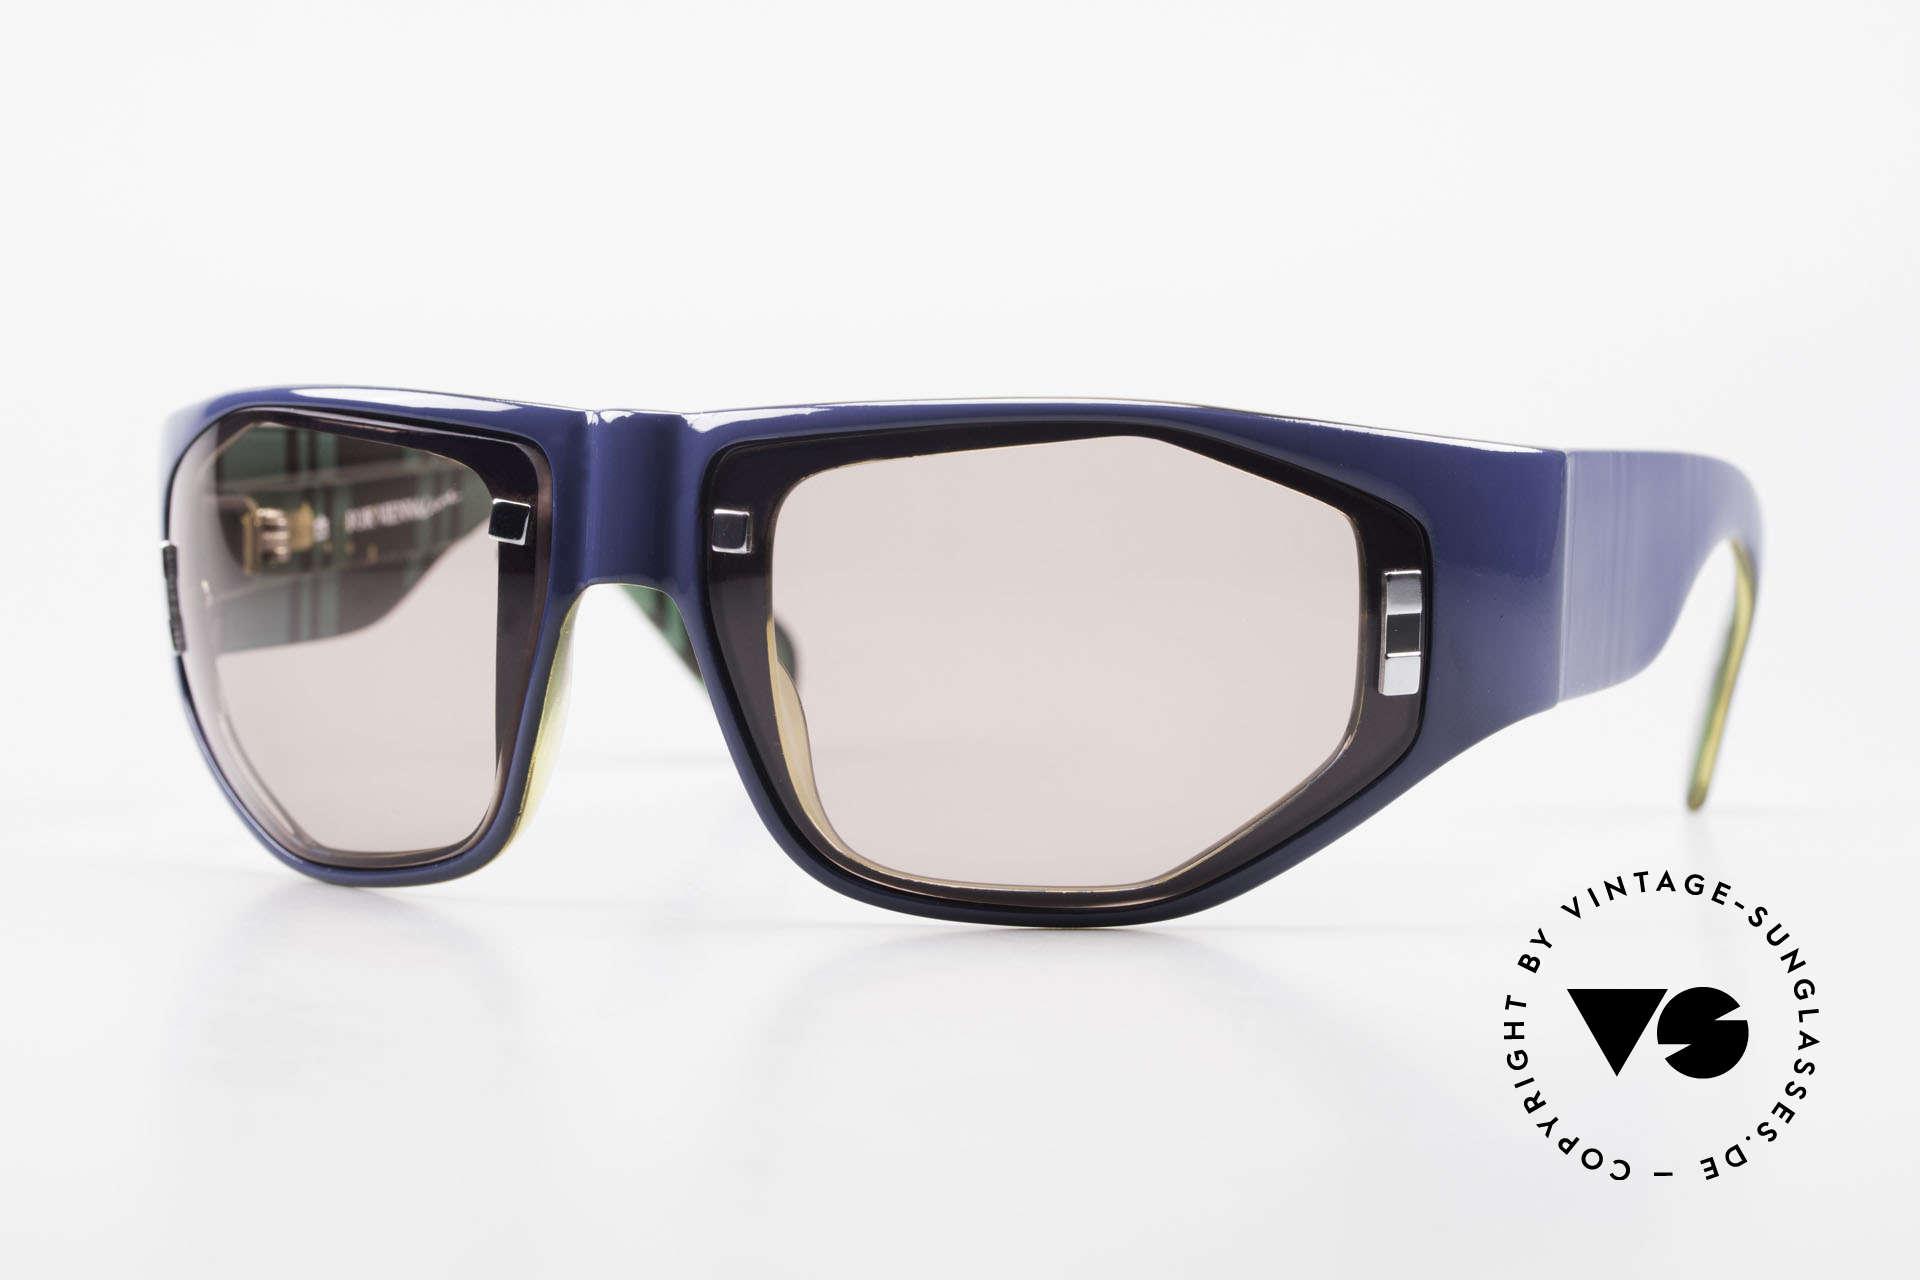 Paloma Picasso 3701 Wrap Around Sunglasses Ladies, vintage ladies sunglasses by P. PICASSO from 1990, Made for Women